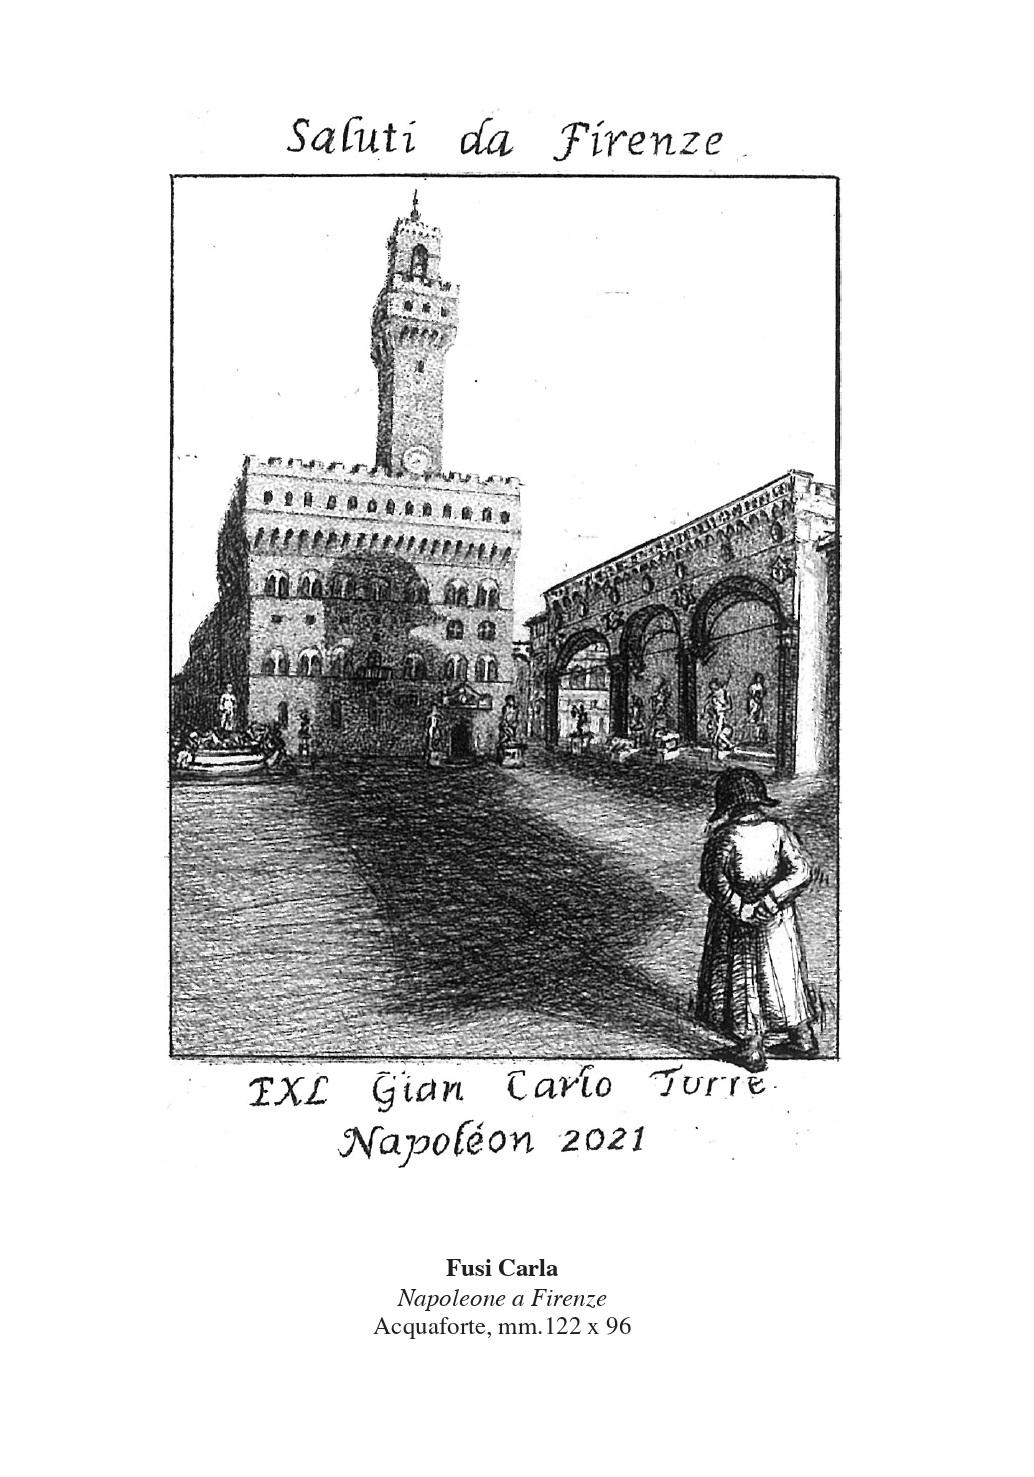 CATALOGO exlibris 2021-81_page-0001